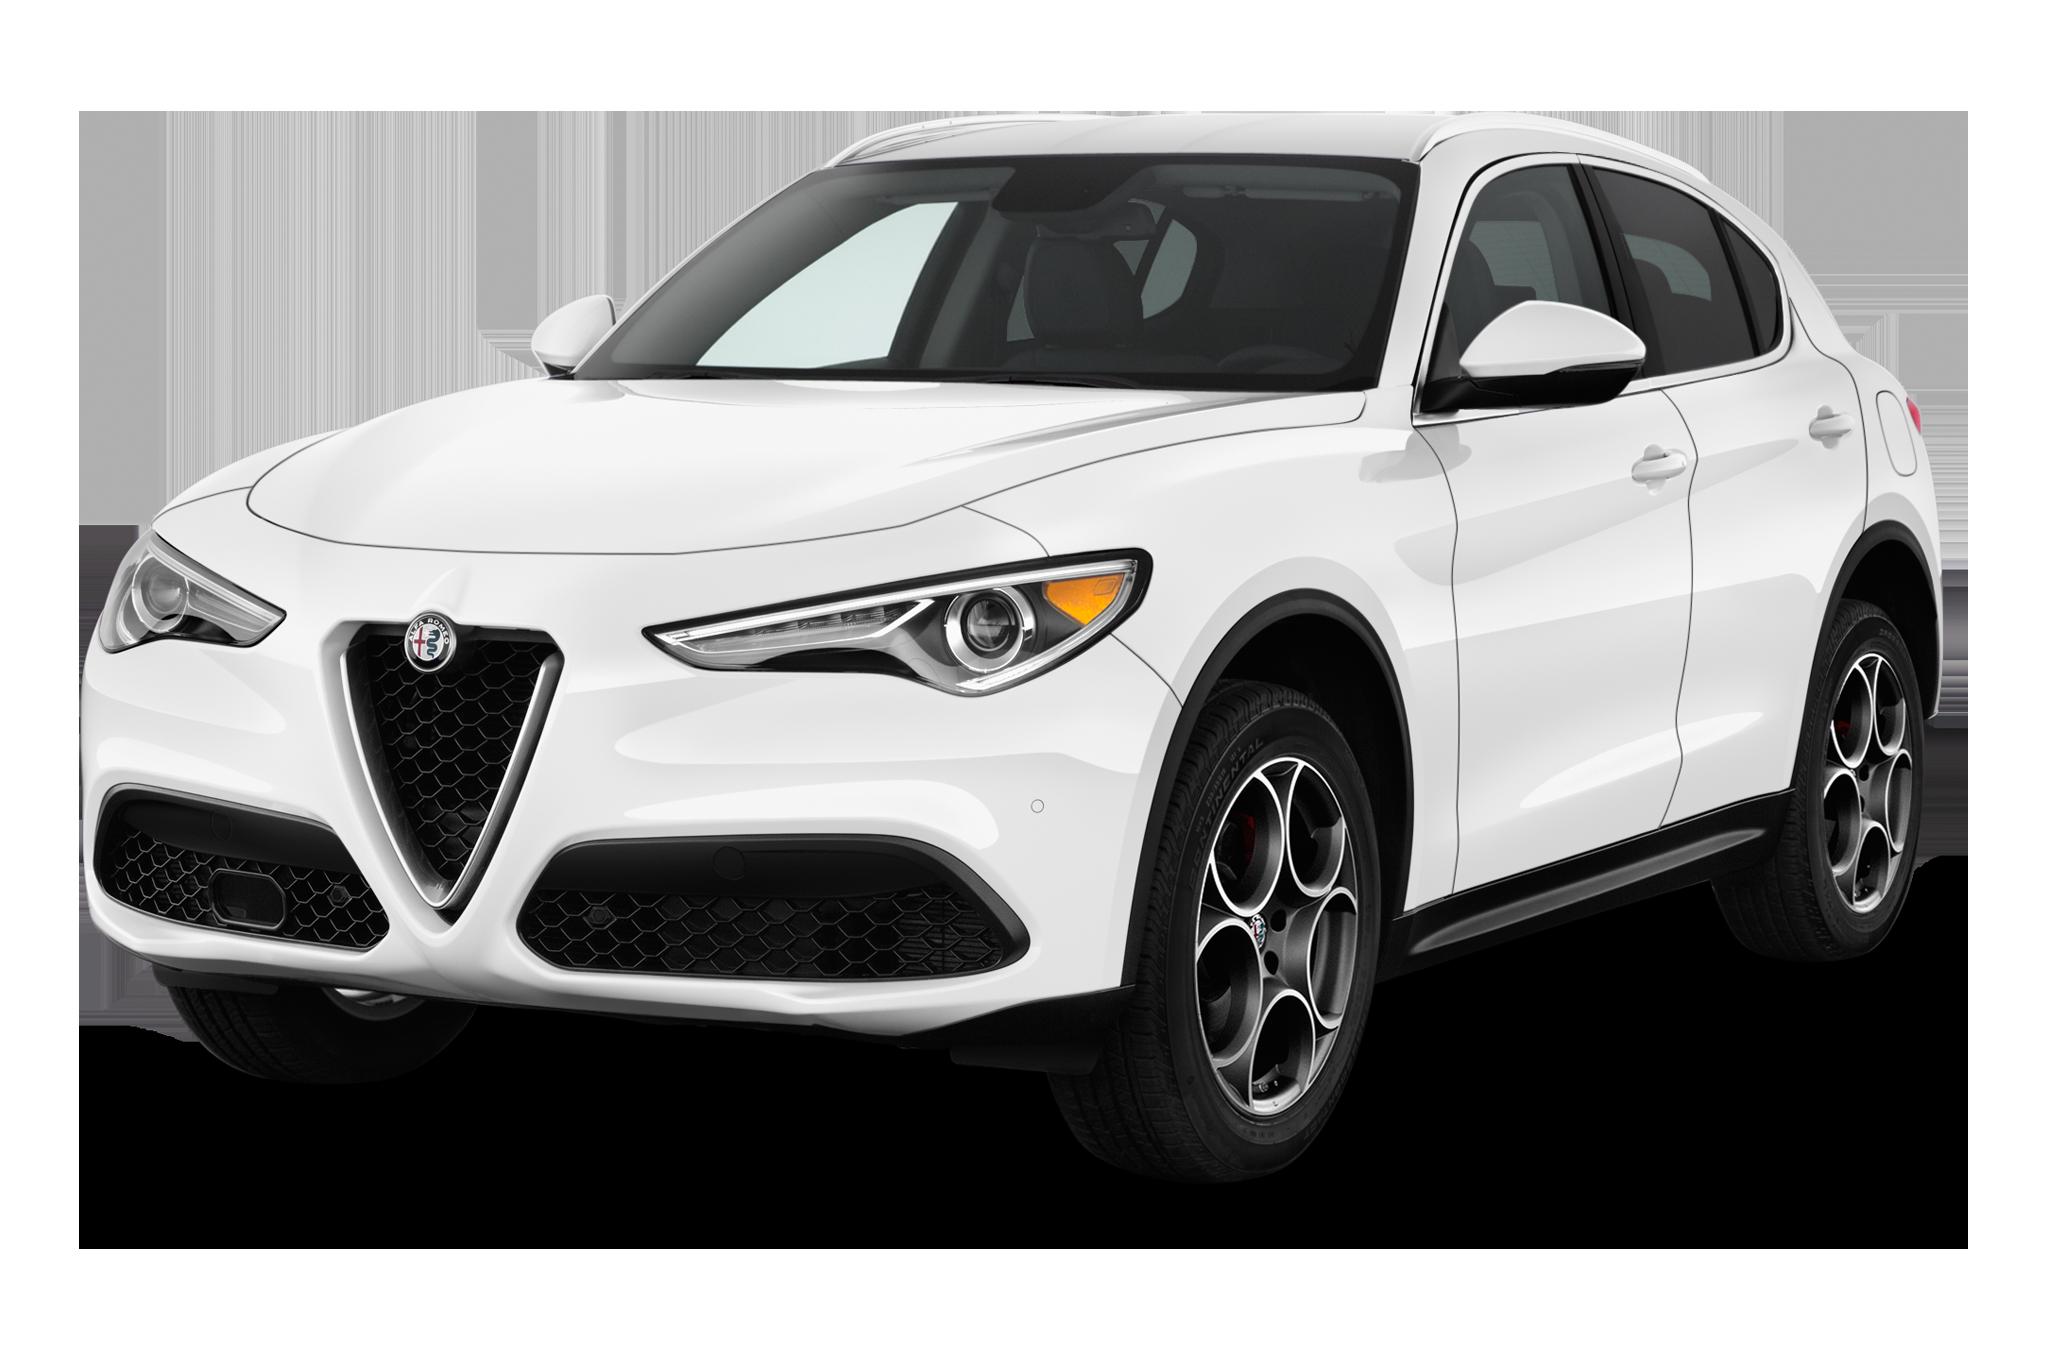 2019 Alfa Romeo Stelvio Overview - MSN Autos